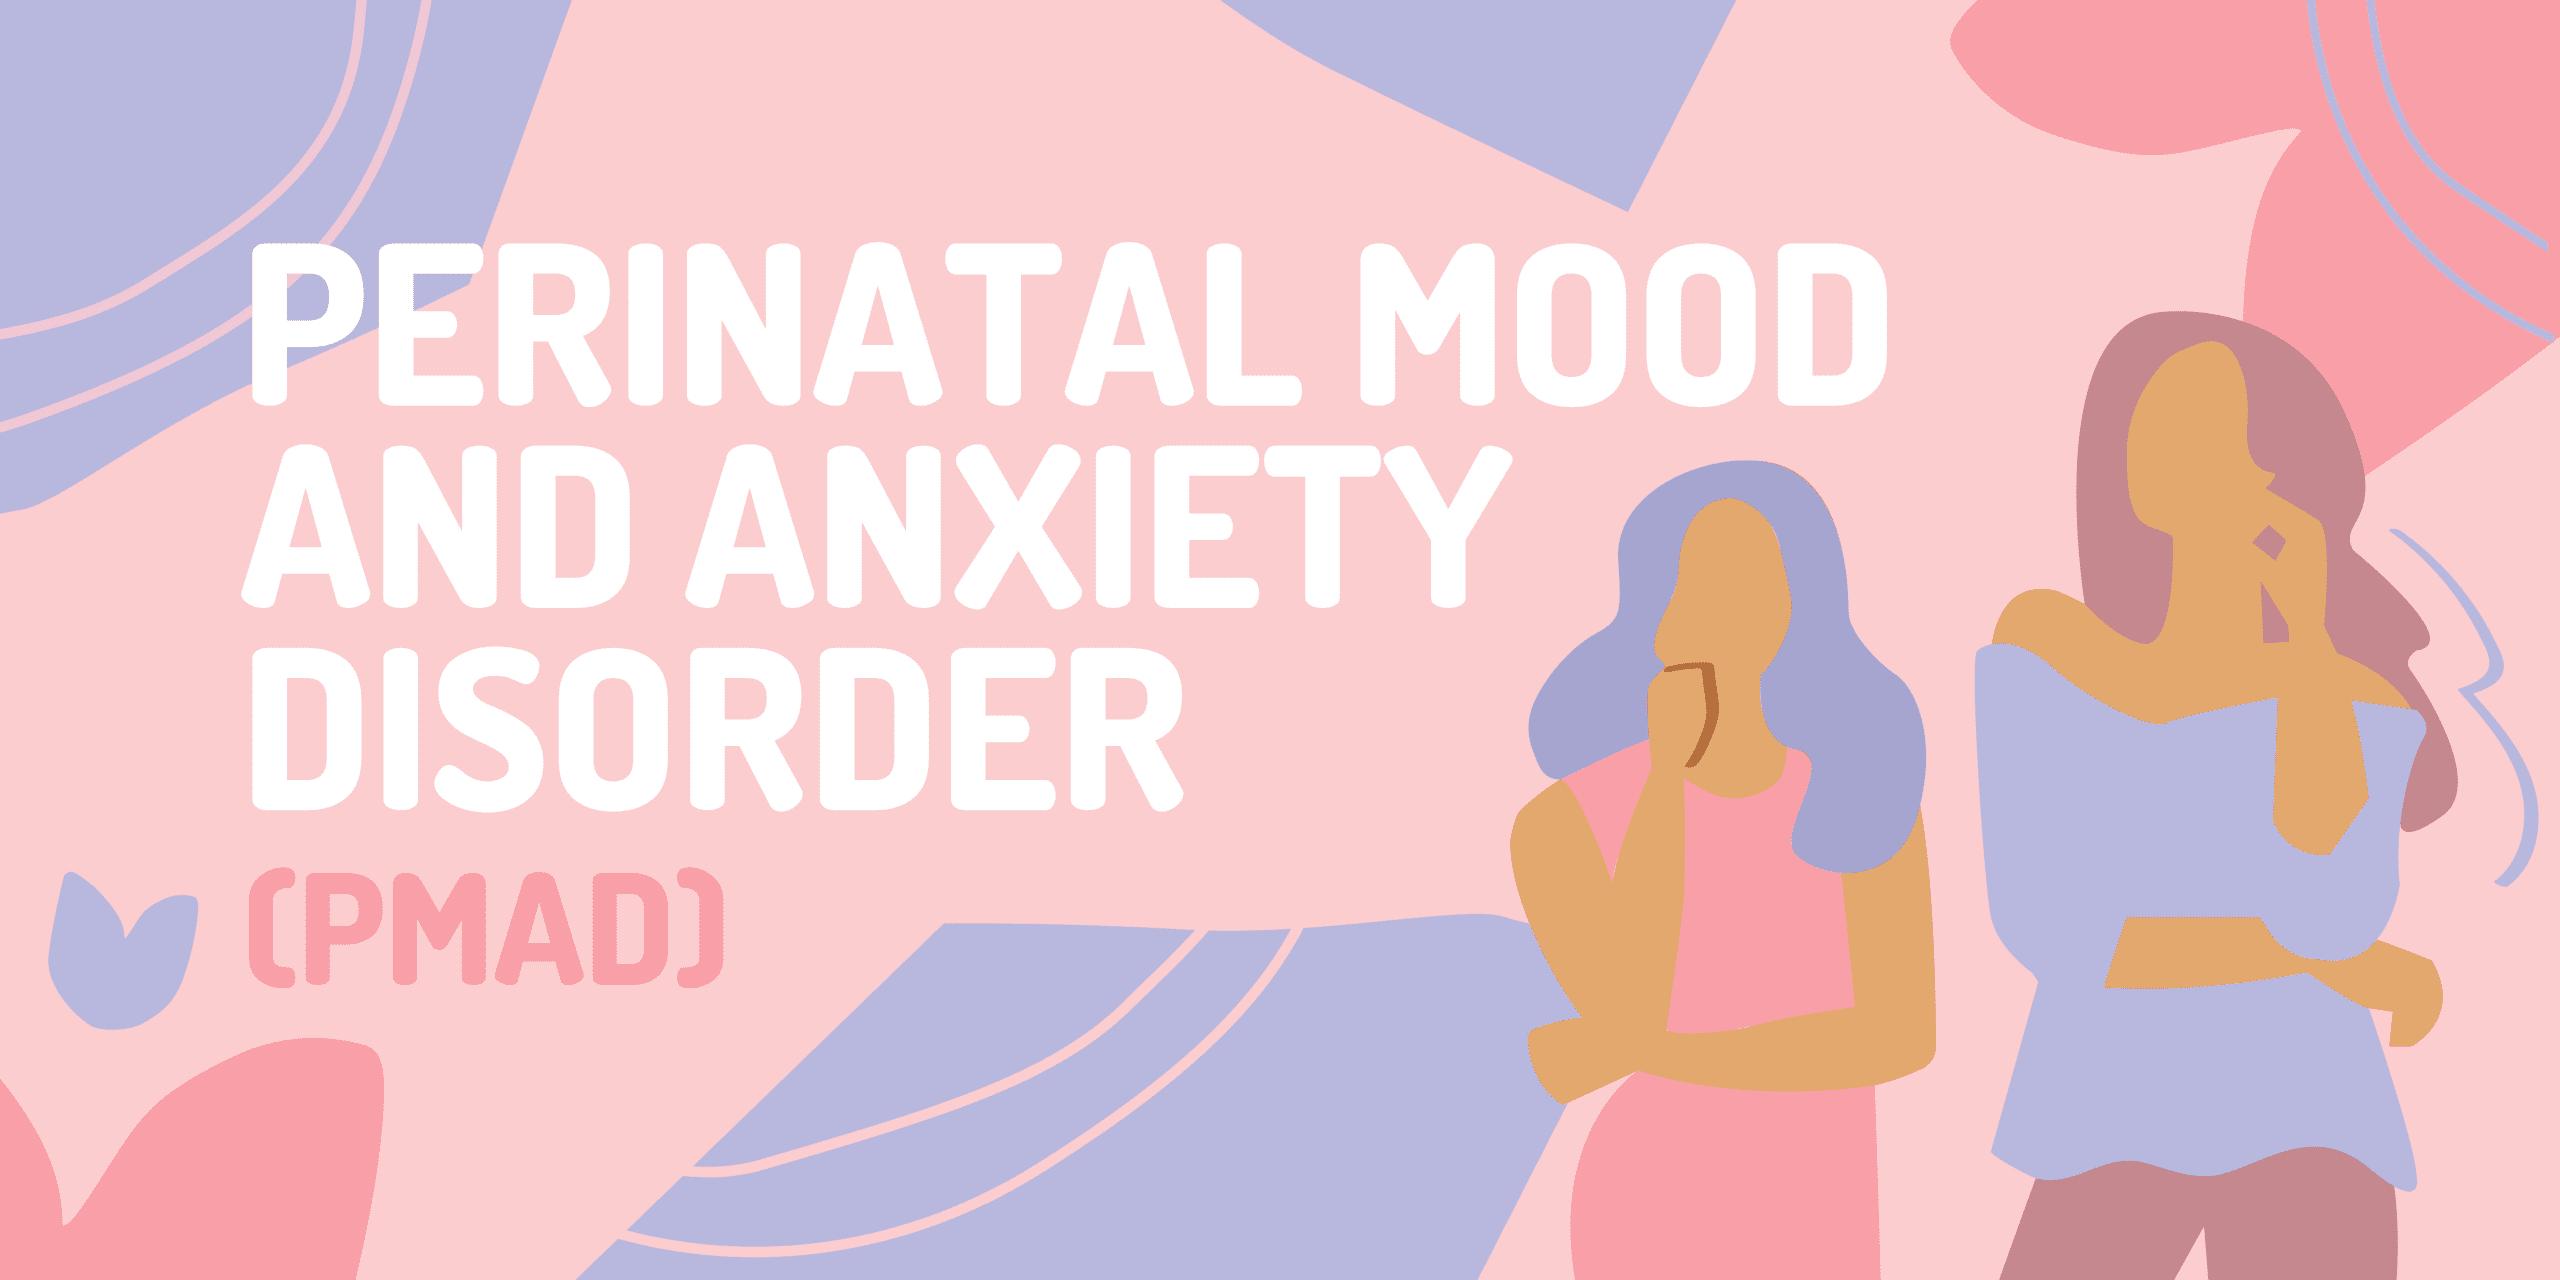 Perinatal Mood and Anxiety Disorder